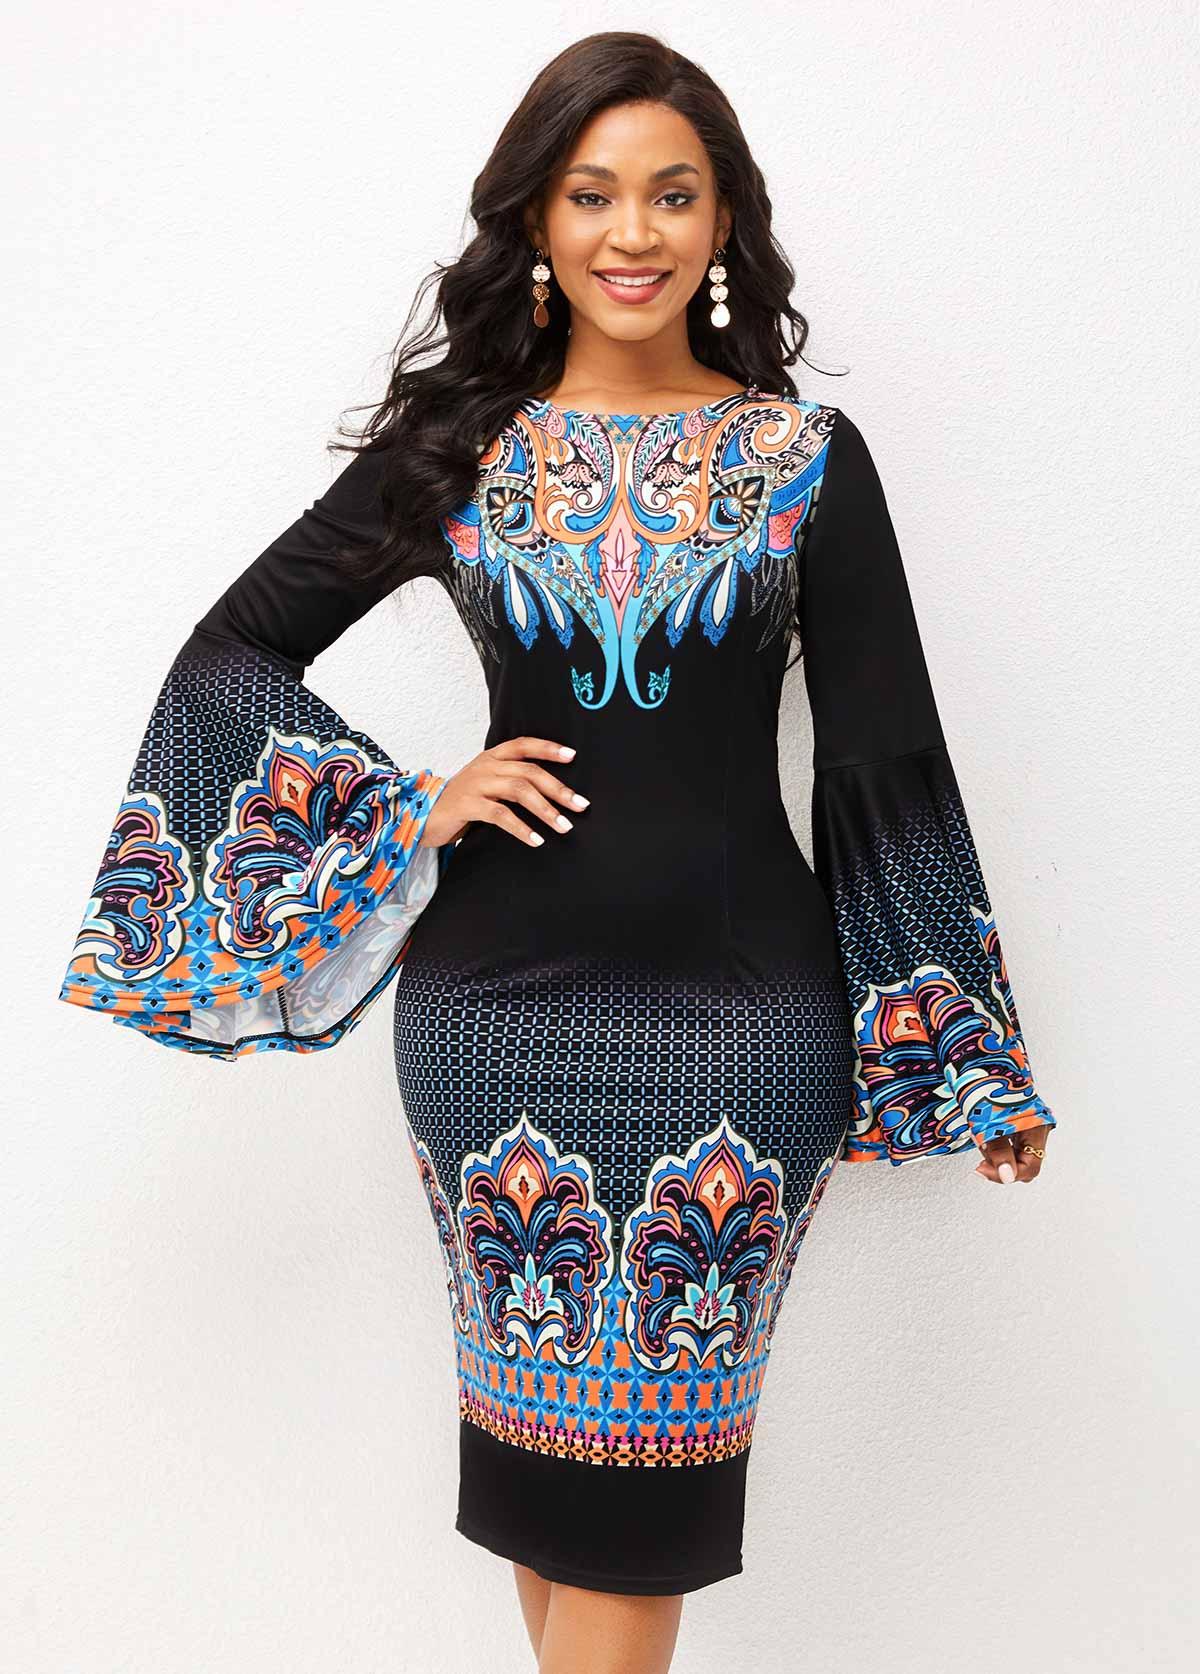 ROTITA Tribal Print Round Neck Flare Sleeve Dress